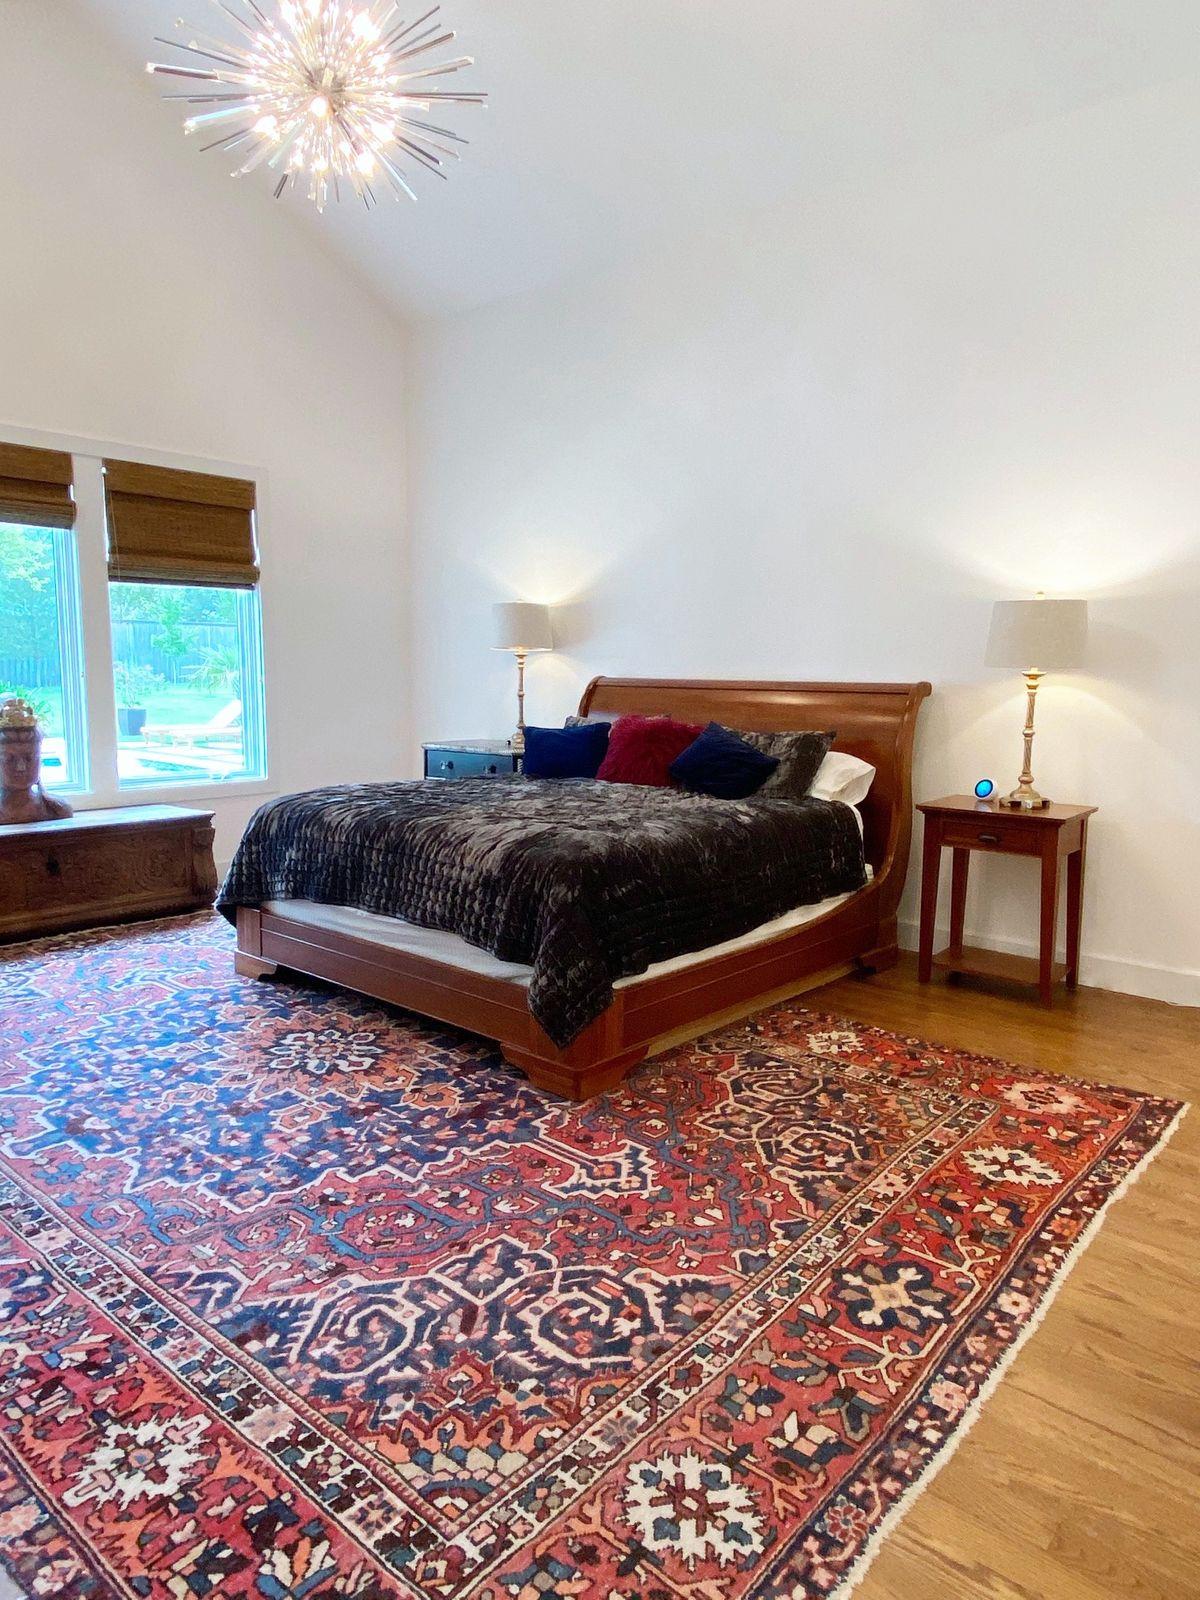 Cindy Mediterranean Home Photo Video Shoot Location Dallas 28.jpg